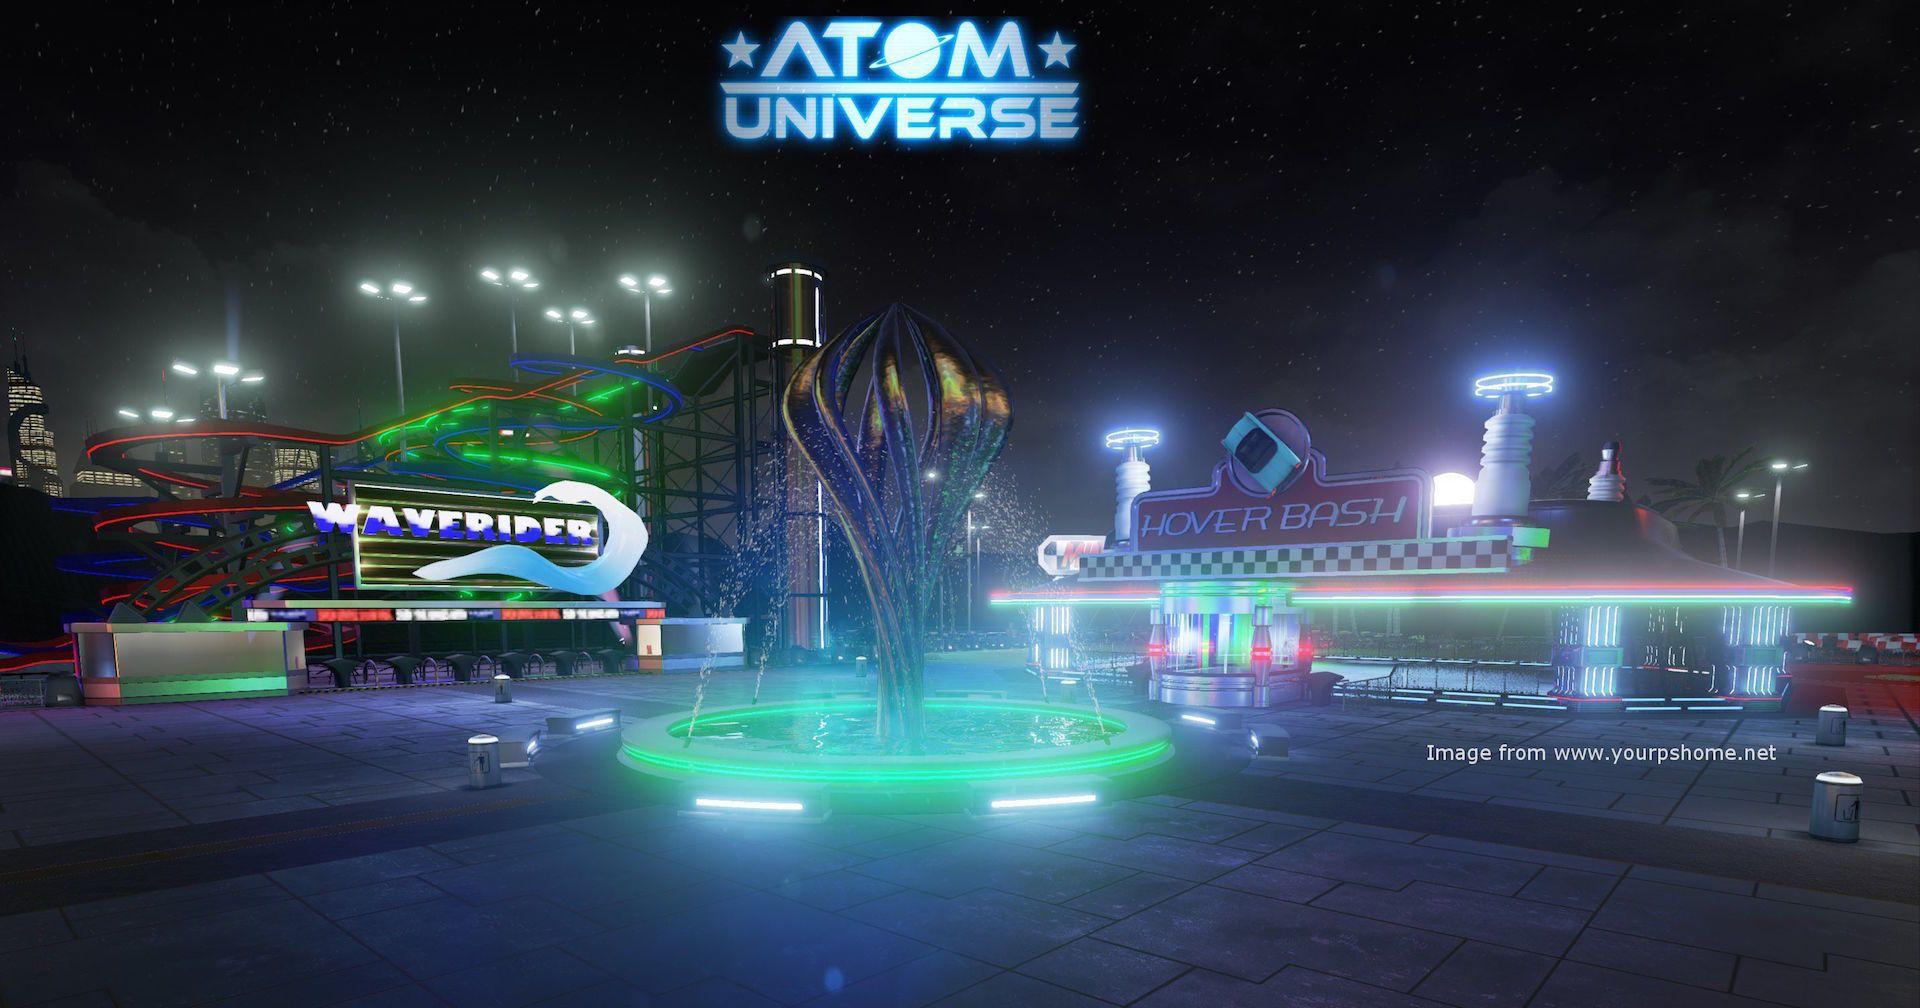 Karen Talks To Atom Republic About Atom Universe, kwoman32, Nov 30, 2014, 4:55 PM, YourPSHome.net, jpg, fountain-copy.jpg